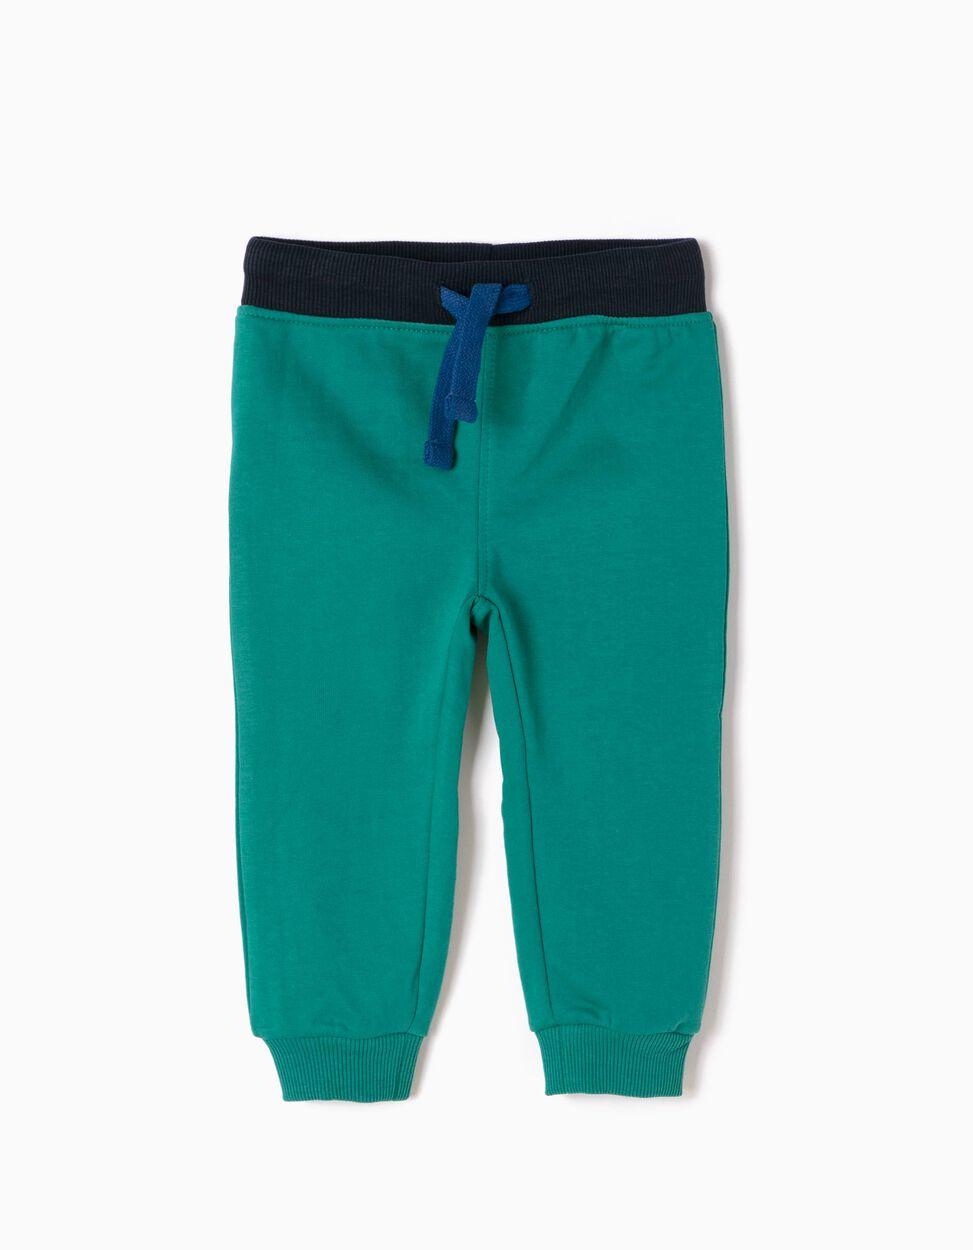 Pantalón de Chándal Fútbol Verde